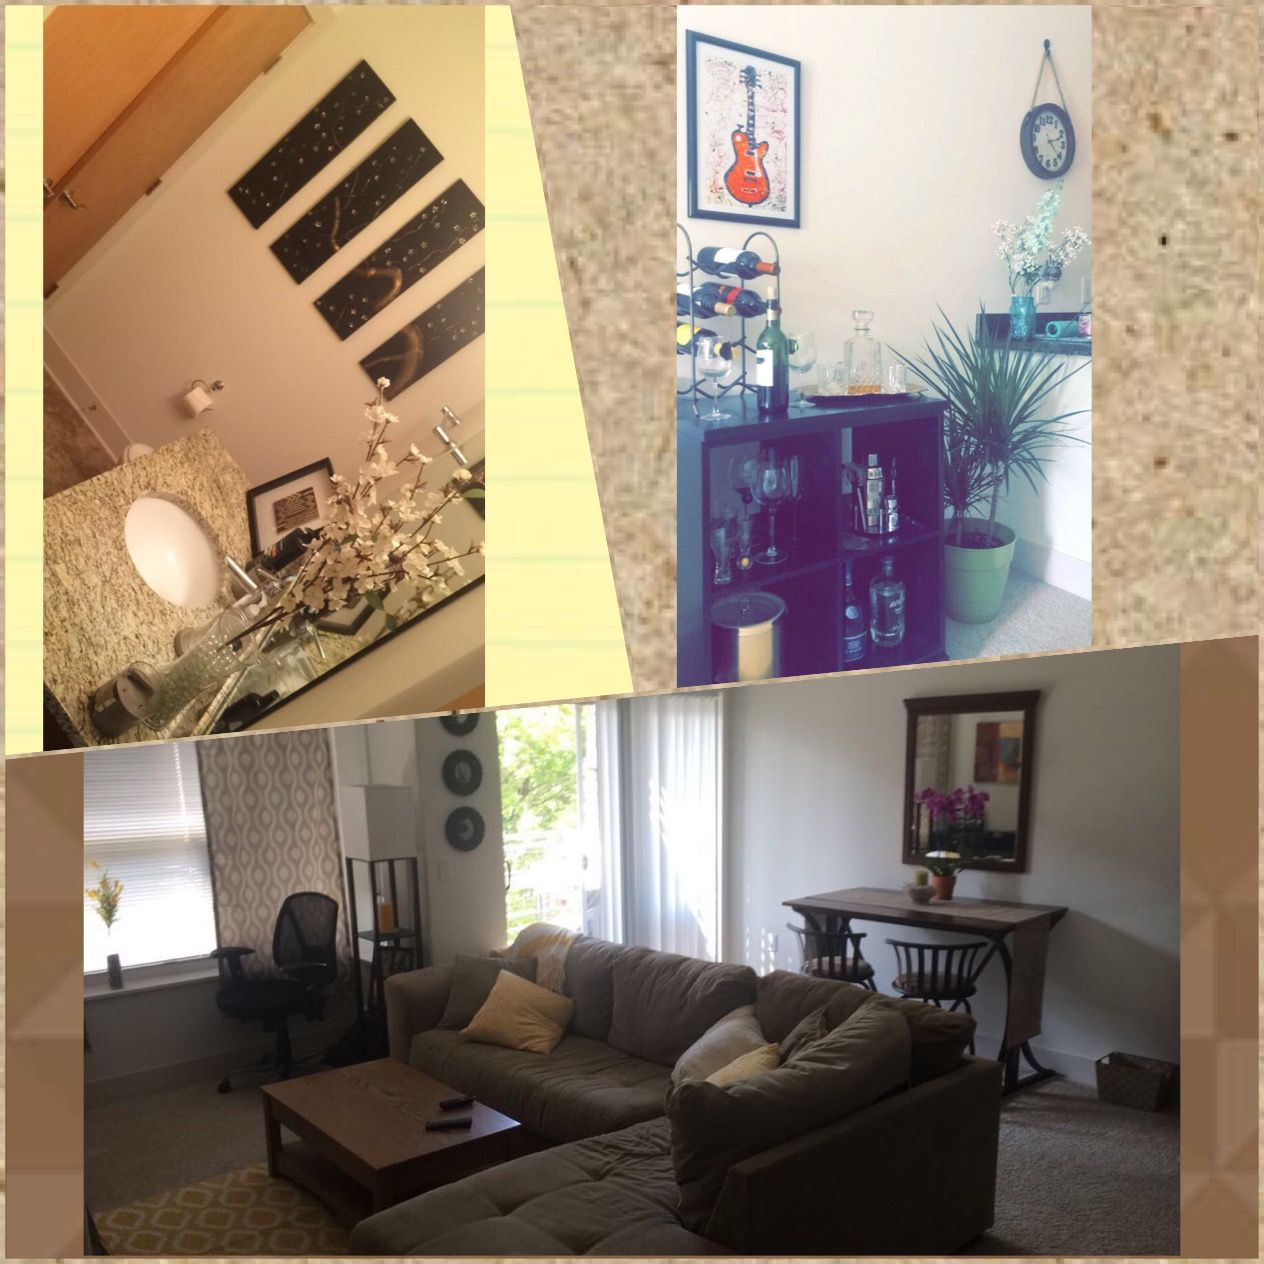 New apartment. Home decor.